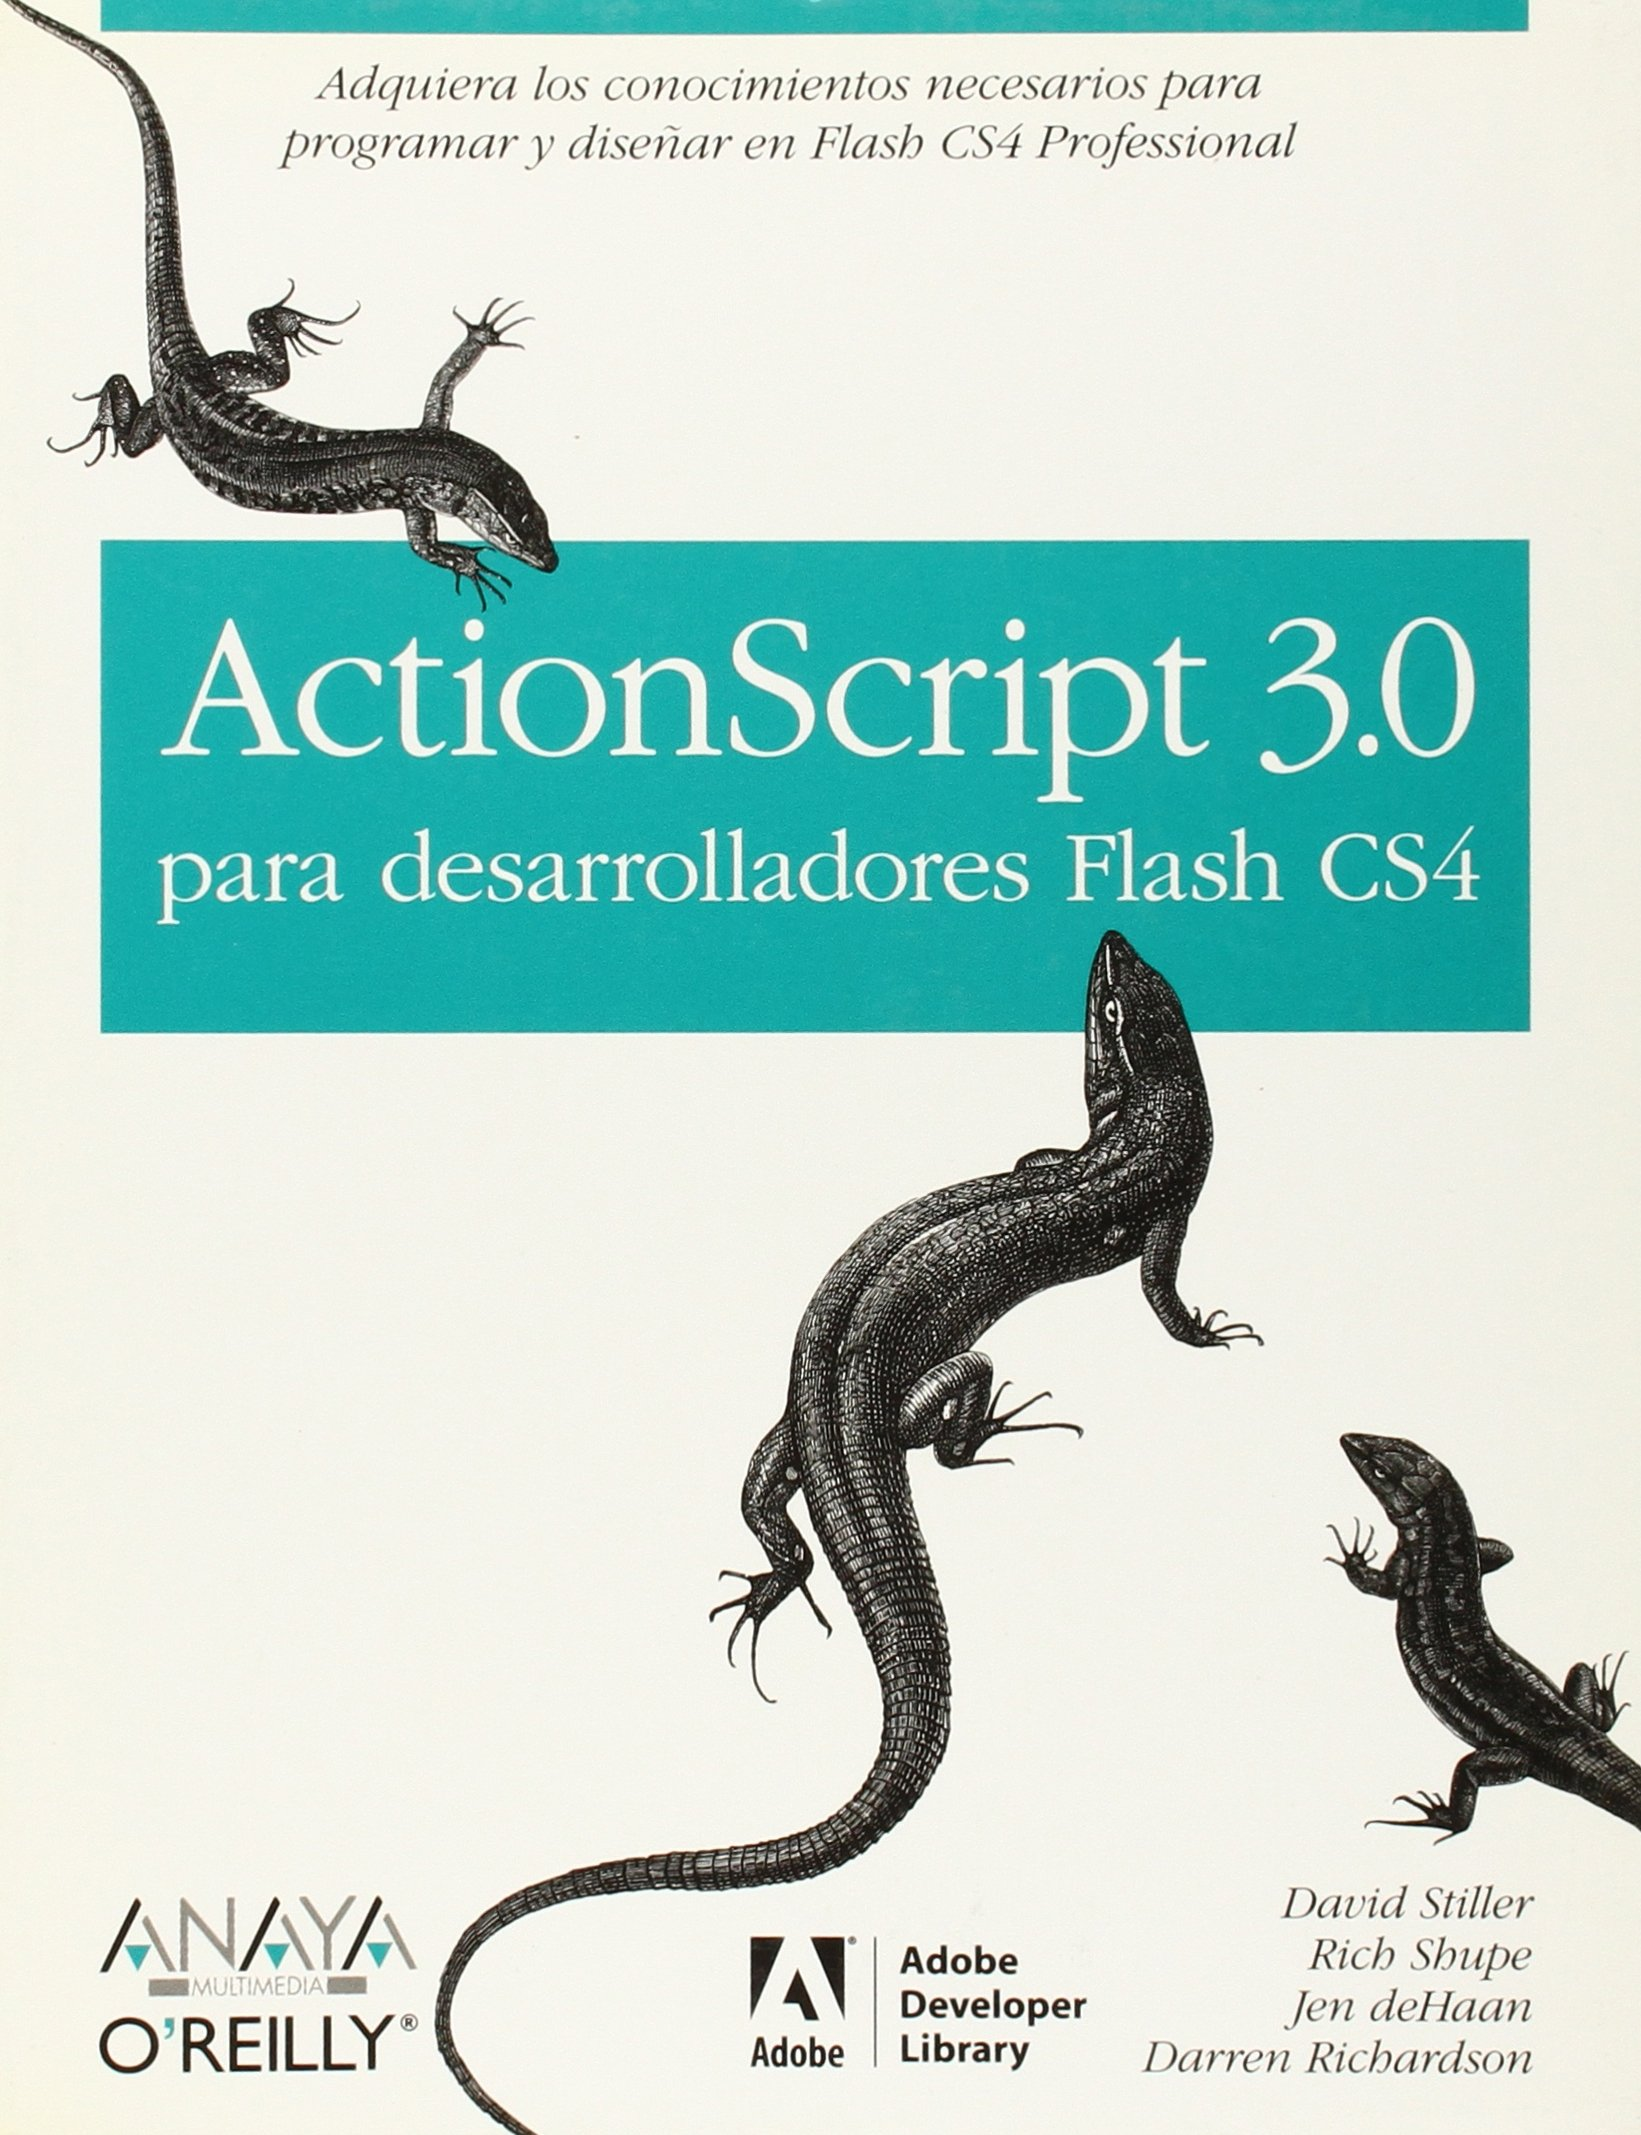 ActionScript 3.0 para desarrolladores Flash CS4/ ActionScript 3.0 Quick Reference Guide (Spanish Edition) PDF